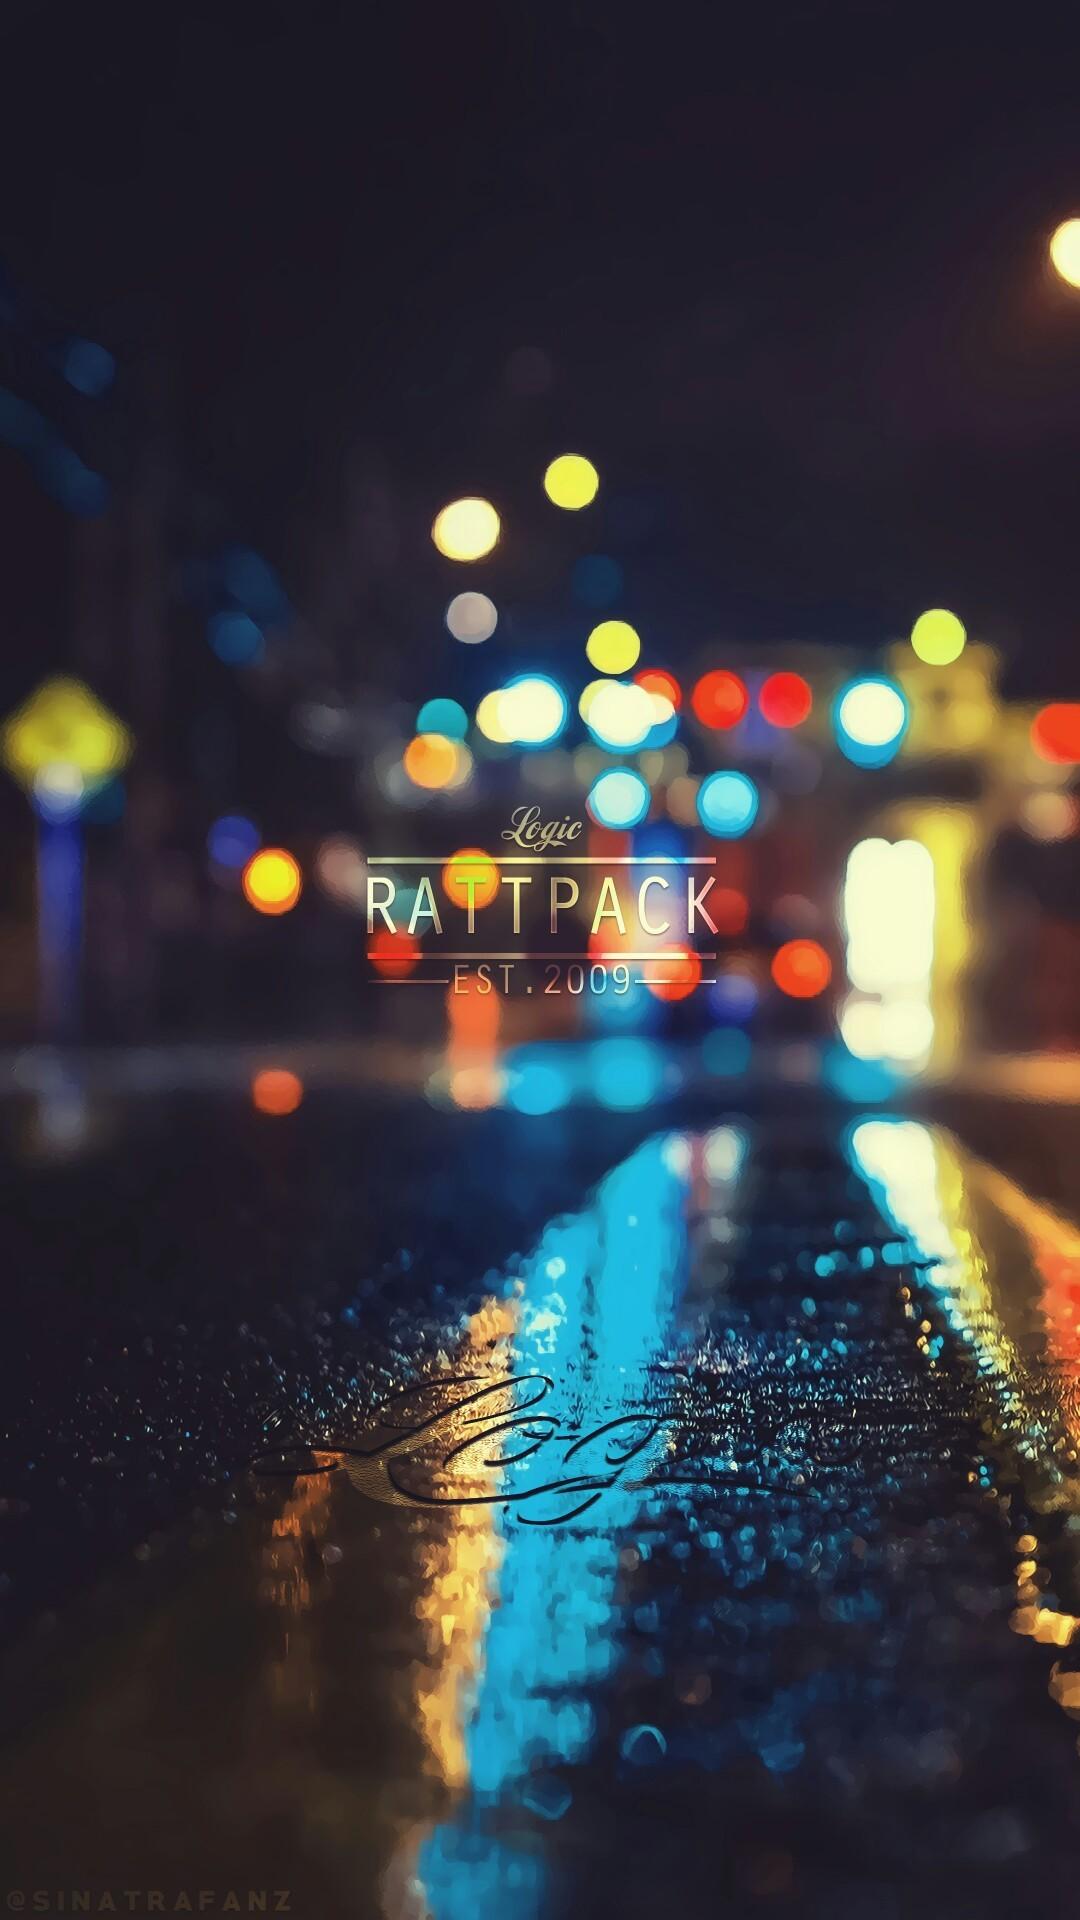 Rattpack, Logic, Sir Robert Bryson Hall II, Wallpaper (Made By [Instagram